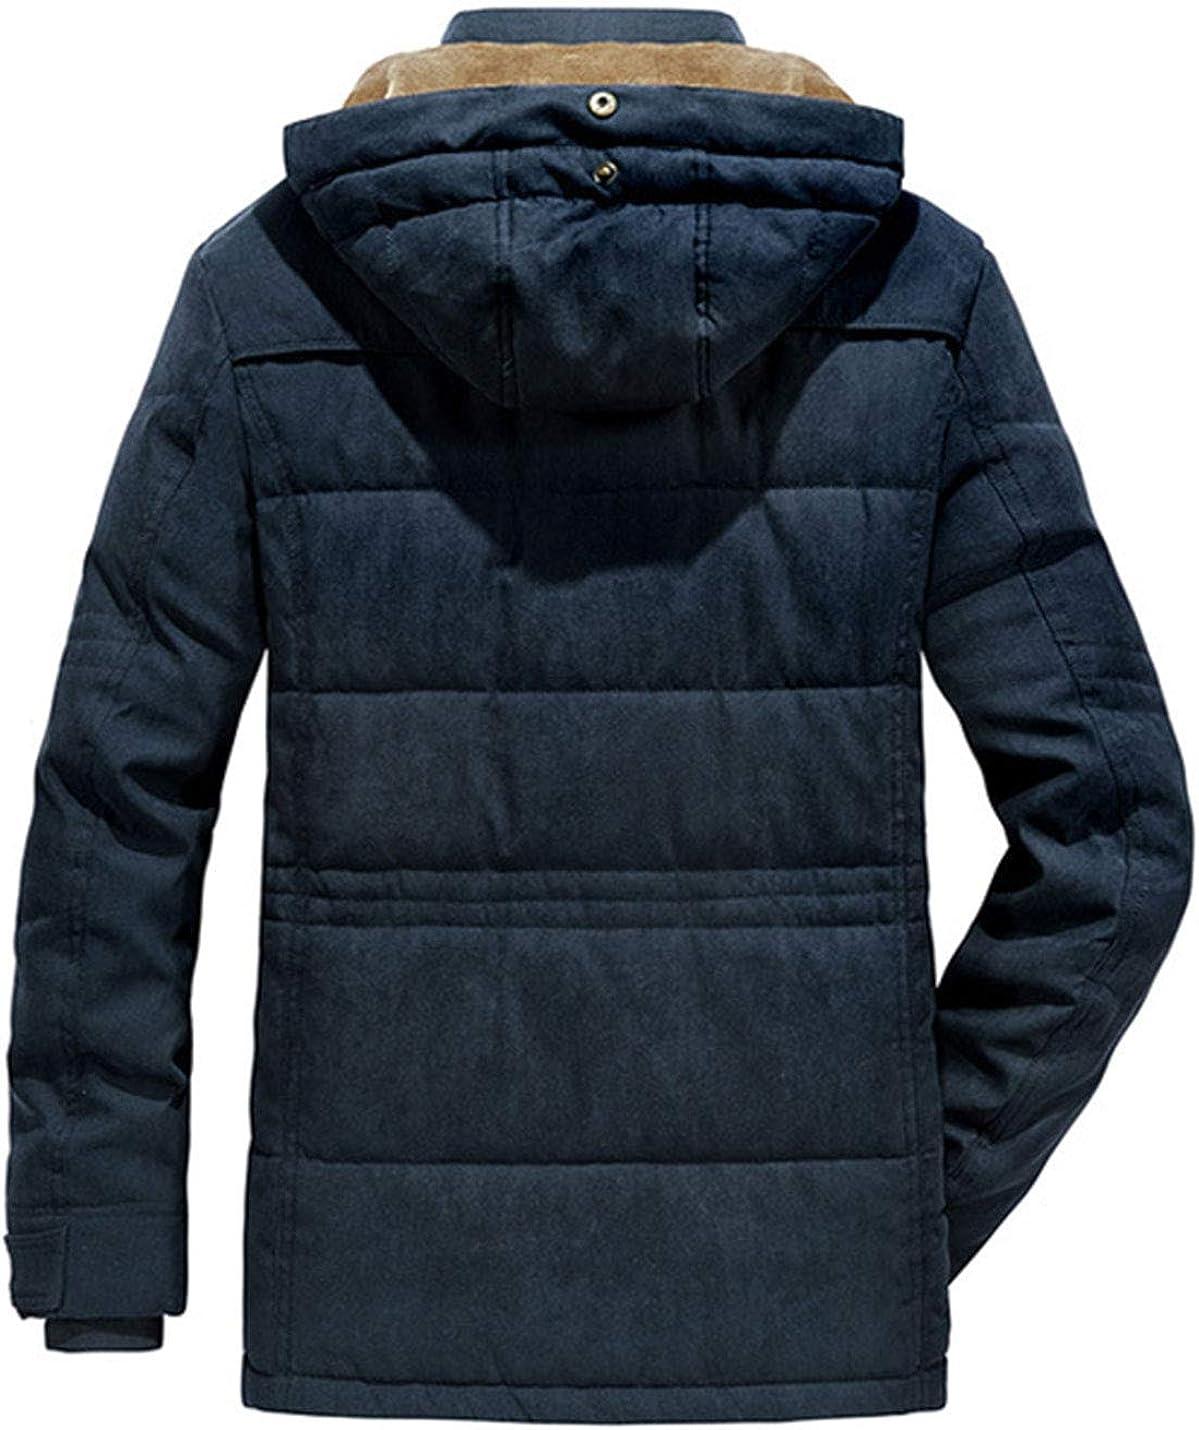 Omoone Men's Loose Winter Fleece Lined Padded Hoodie Ski Jacket Coat Outercoat